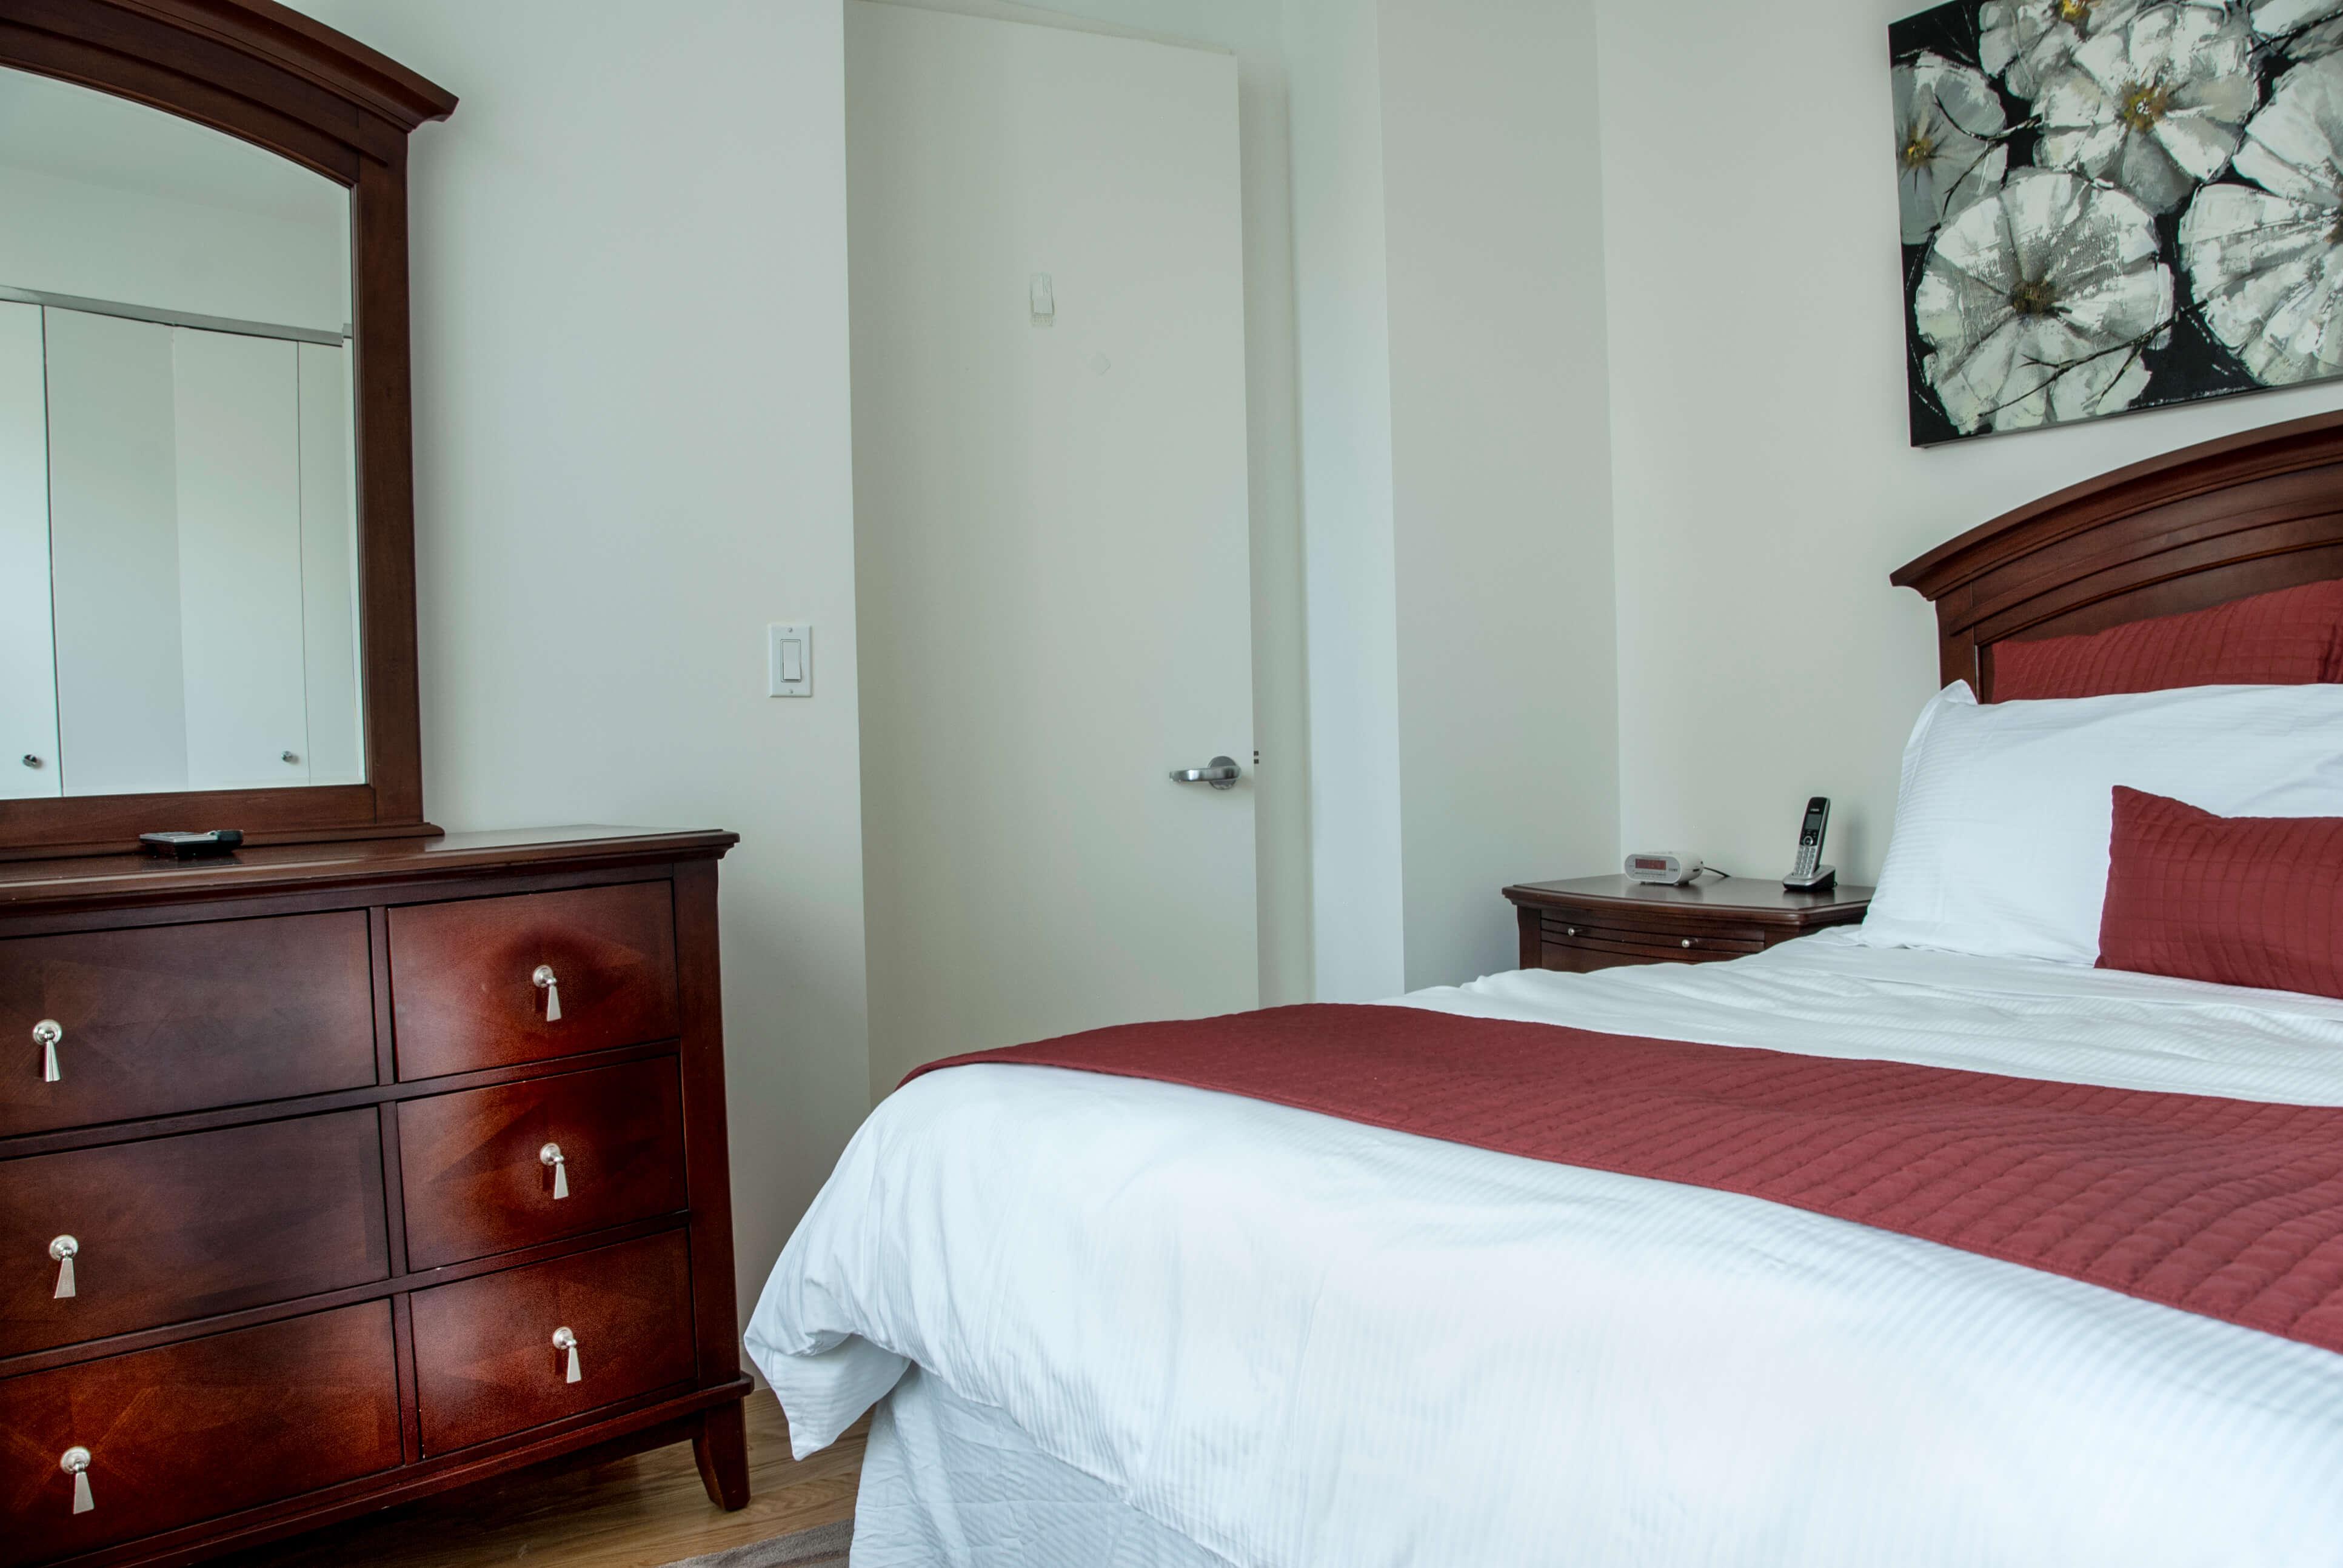 image 3 furnished 1 bedroom Apartment for rent in Upper East Side, Manhattan